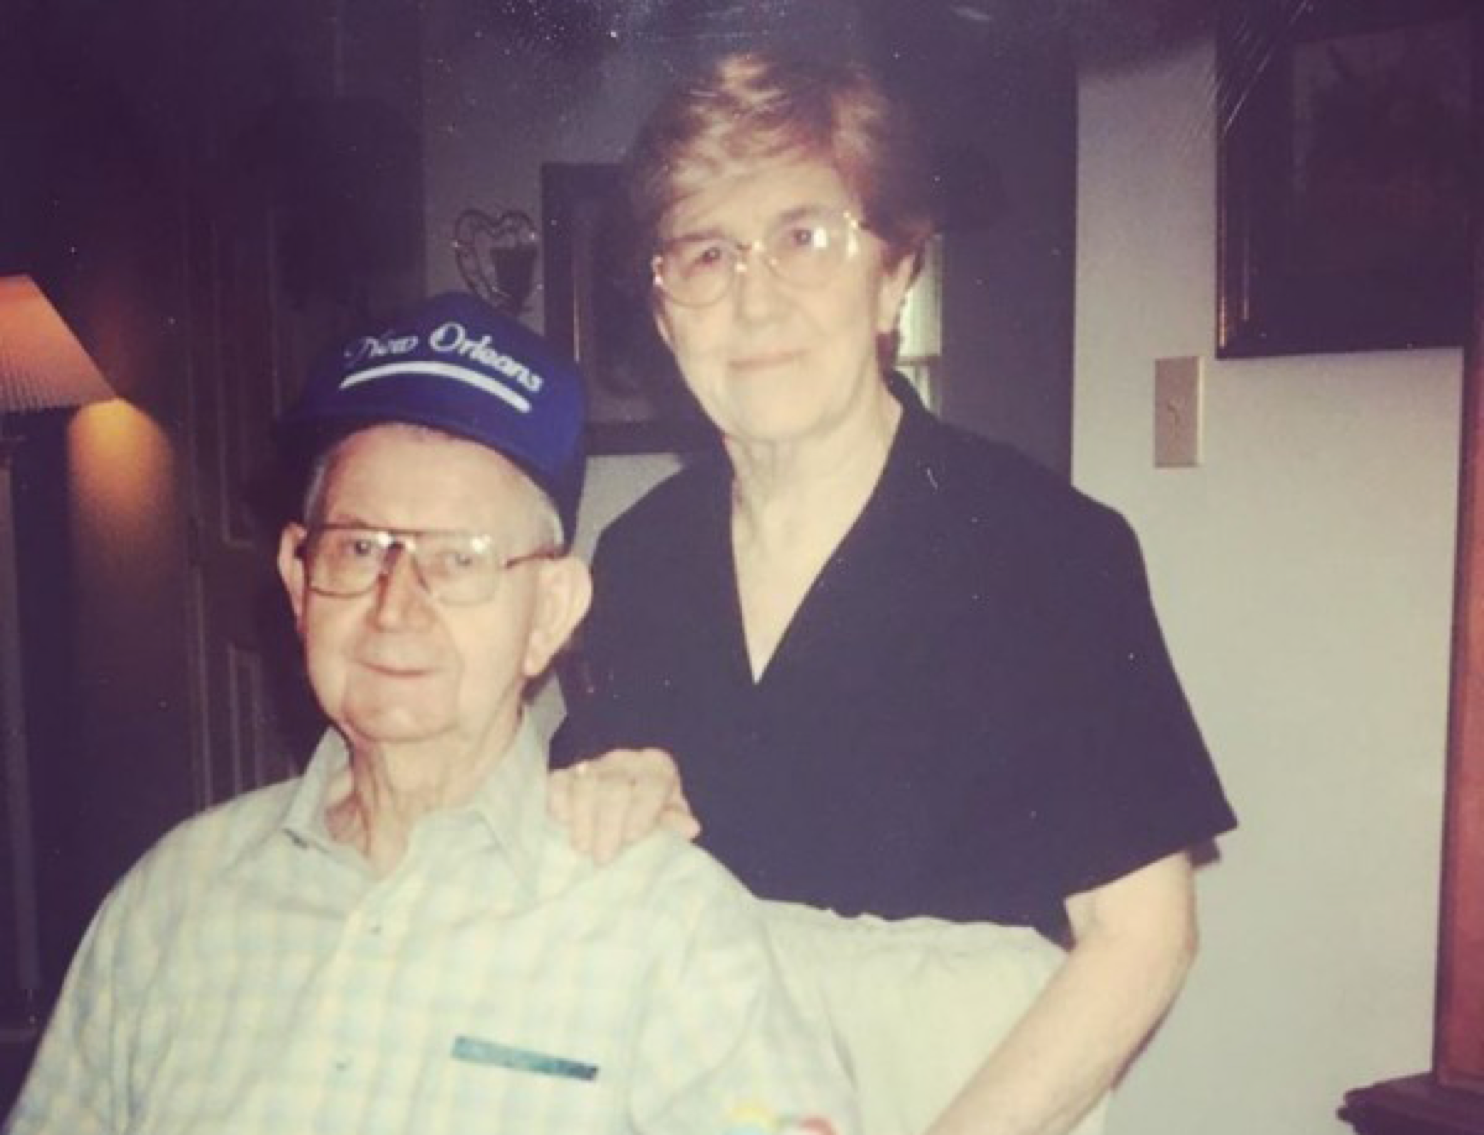 Grandma and Grandpa pose by birthday cake